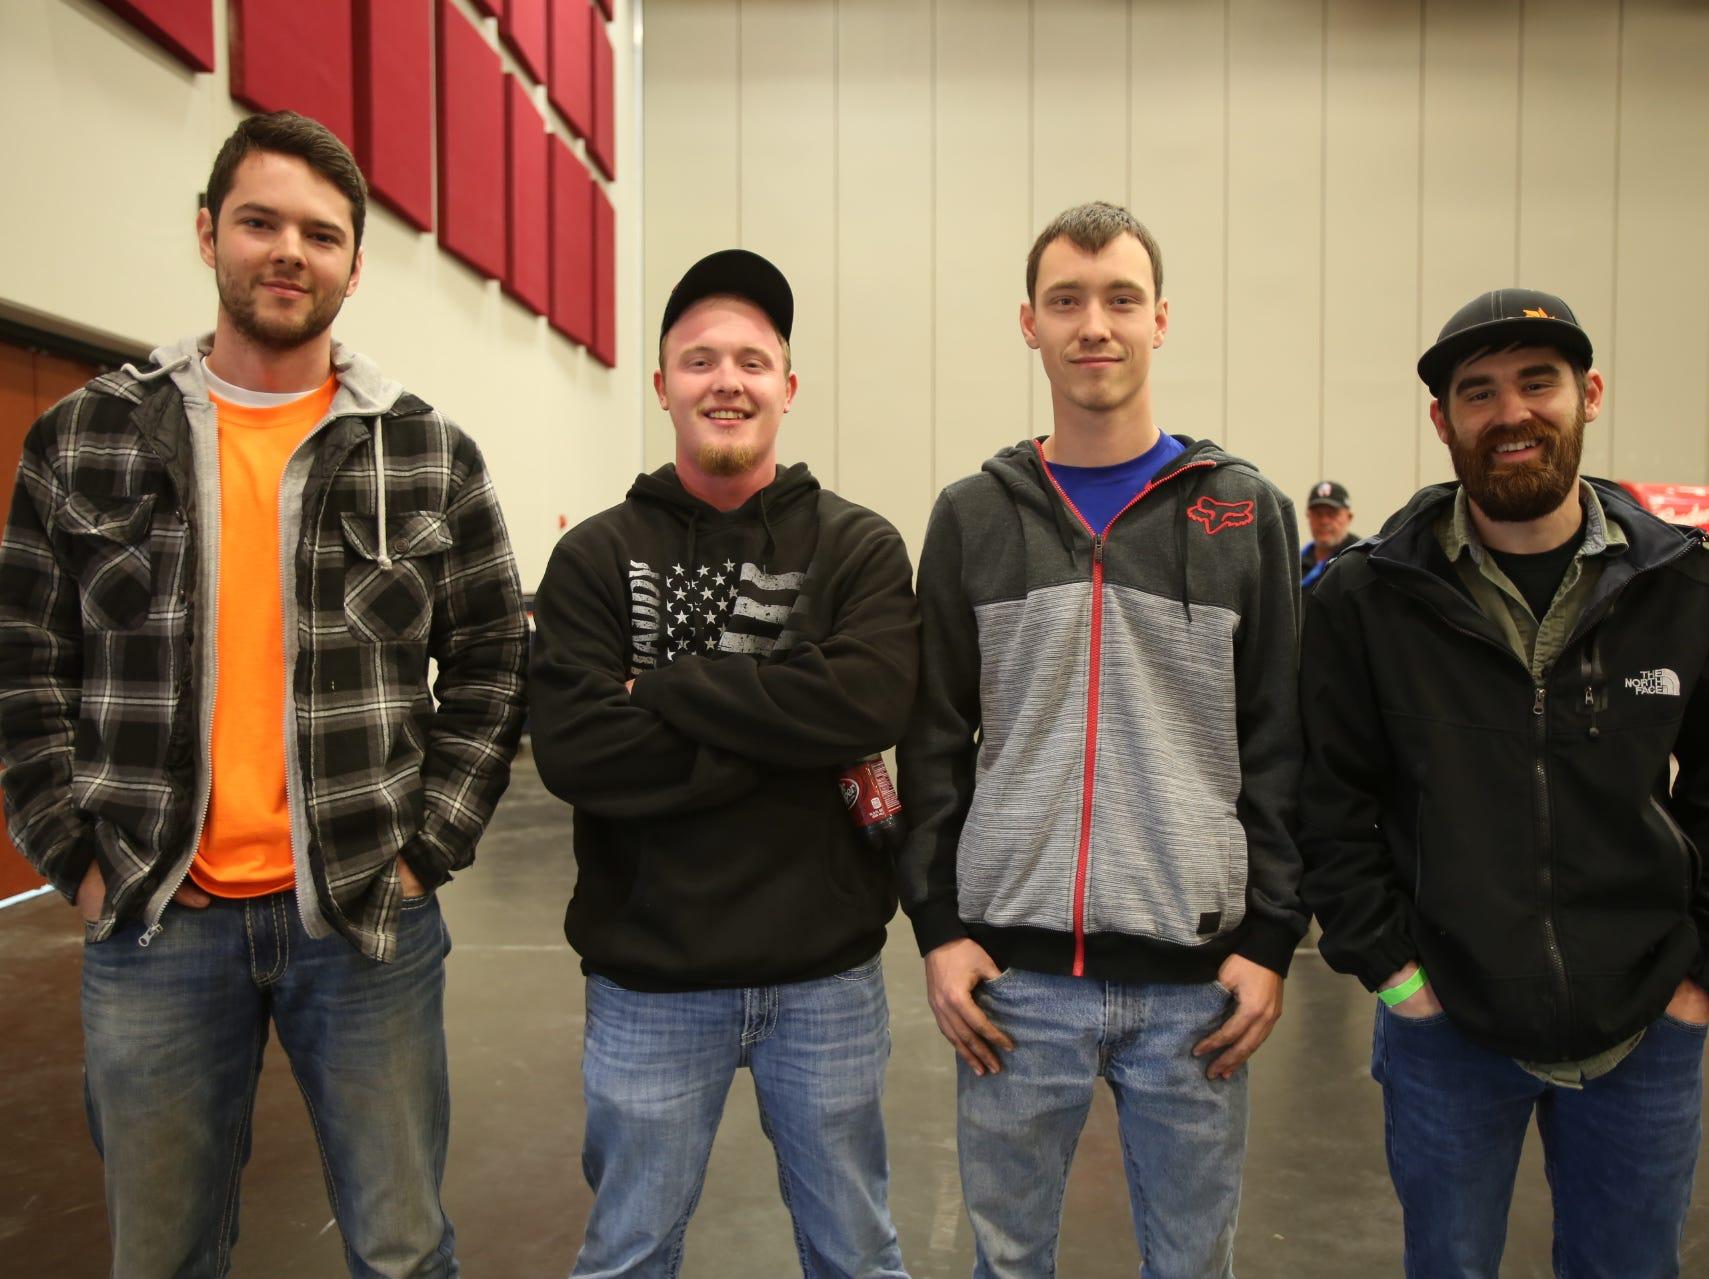 Jusitn Johnson, Tyler Tracy, Glenn Murray, and Kyle Whobrey